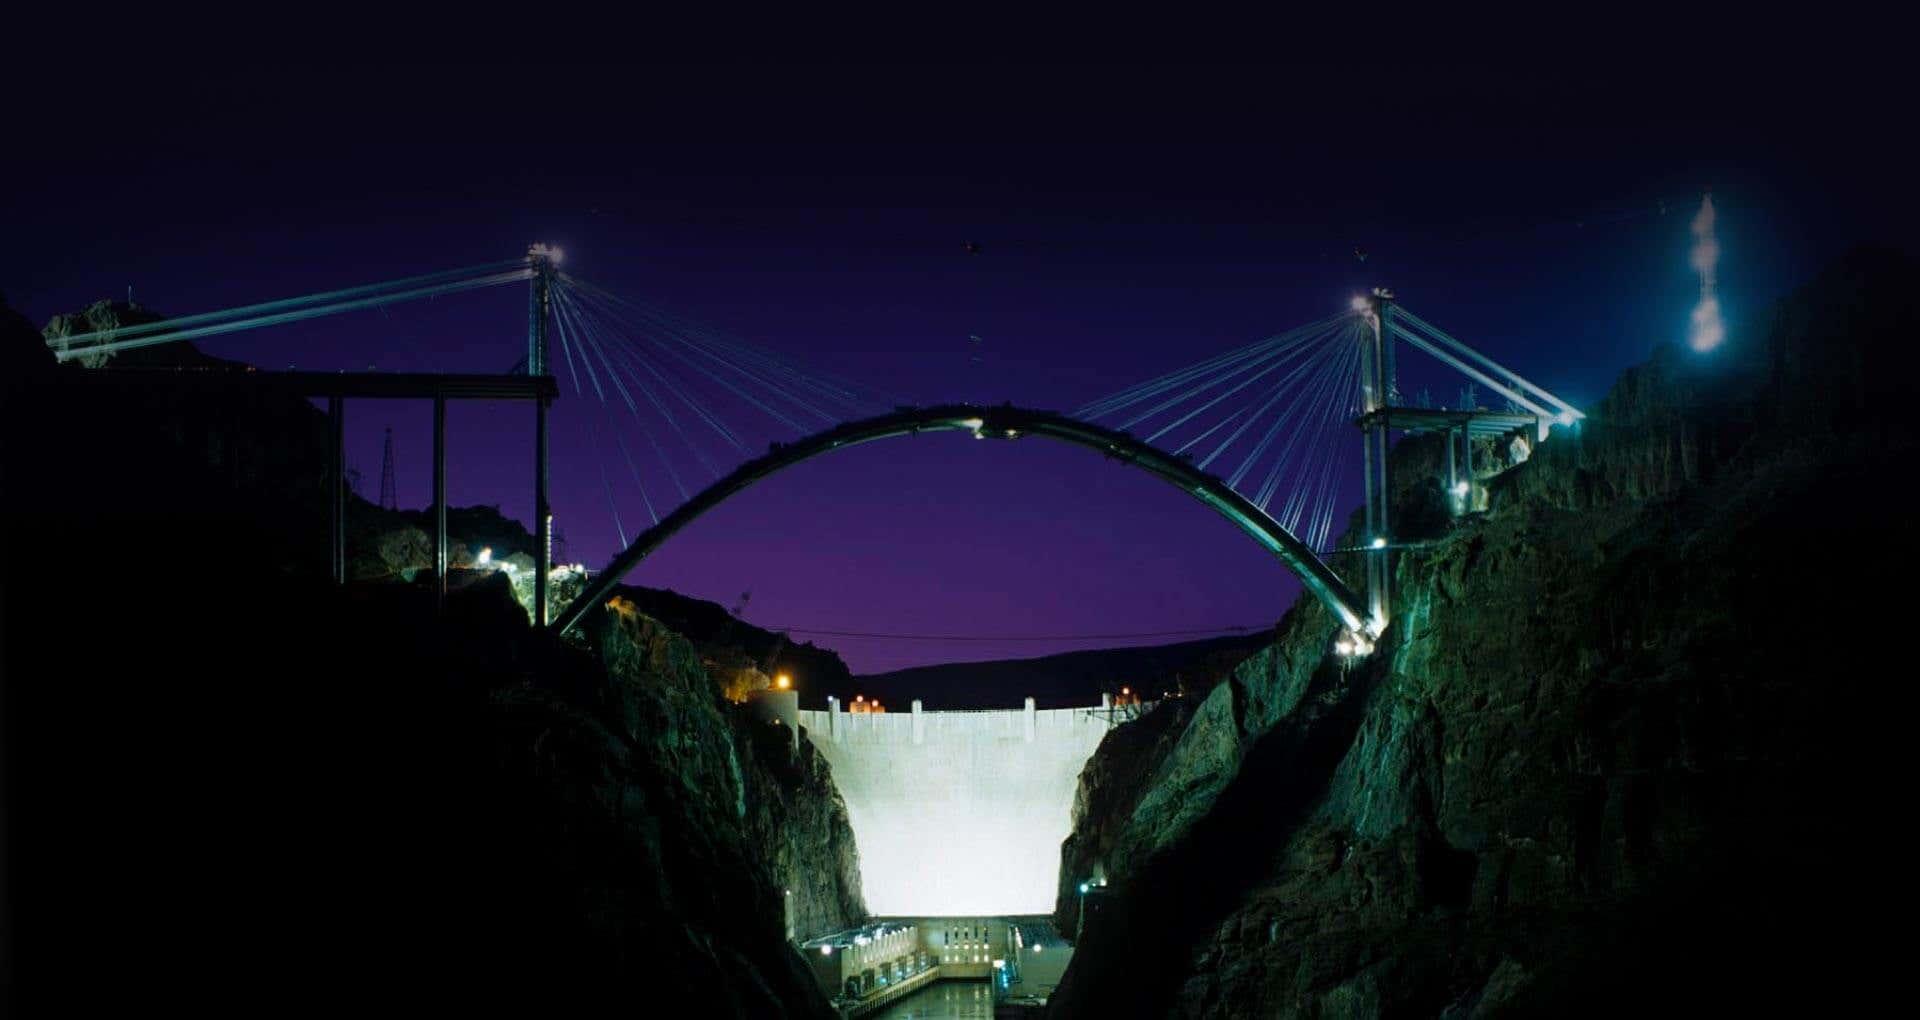 Bridge structure over a water dam